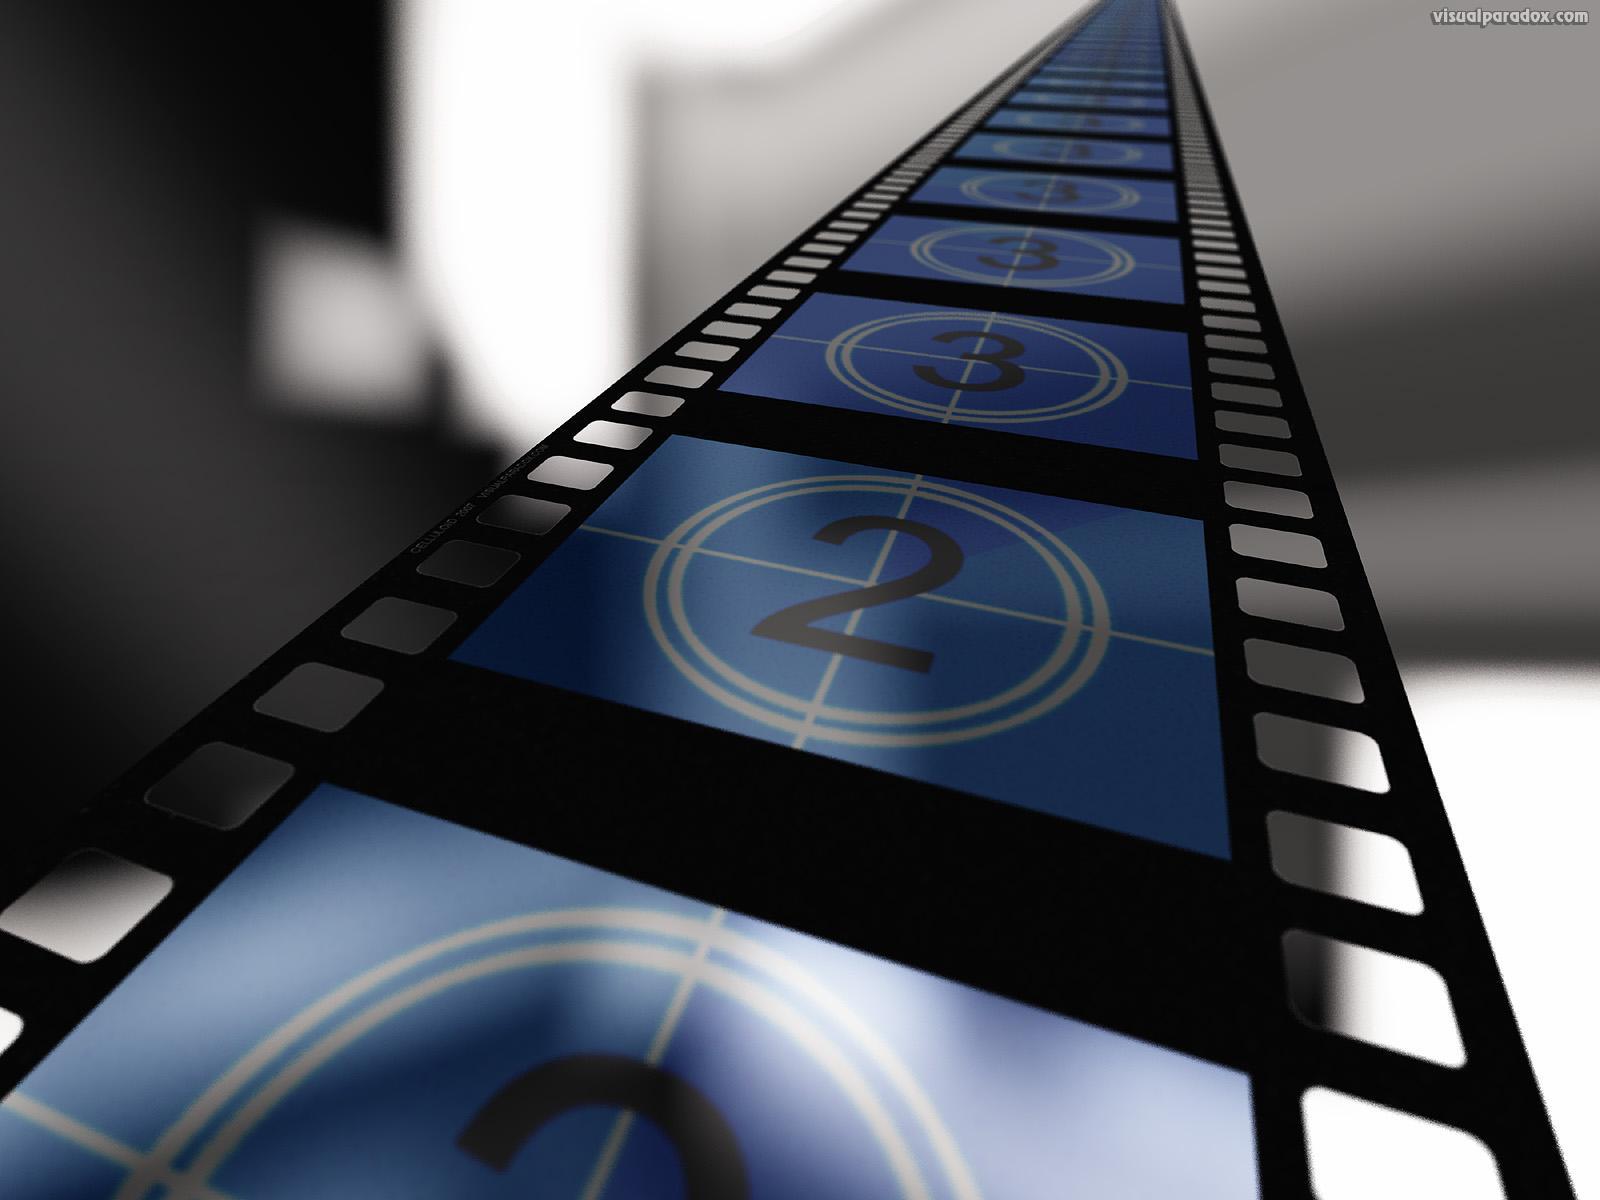 pantalla-de-cine-6